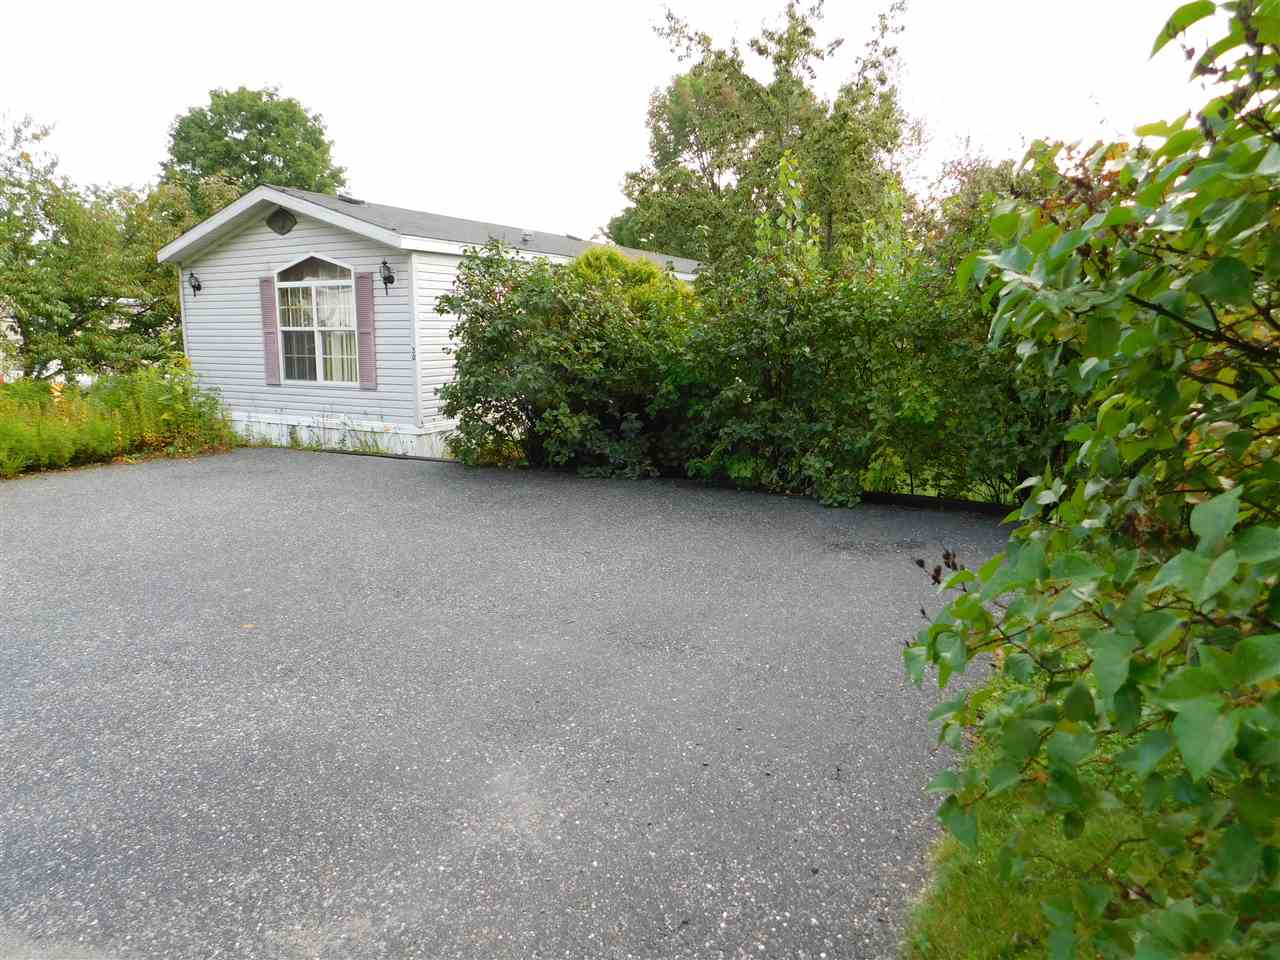 Homes For Sale Hillsboro County New Hampshire